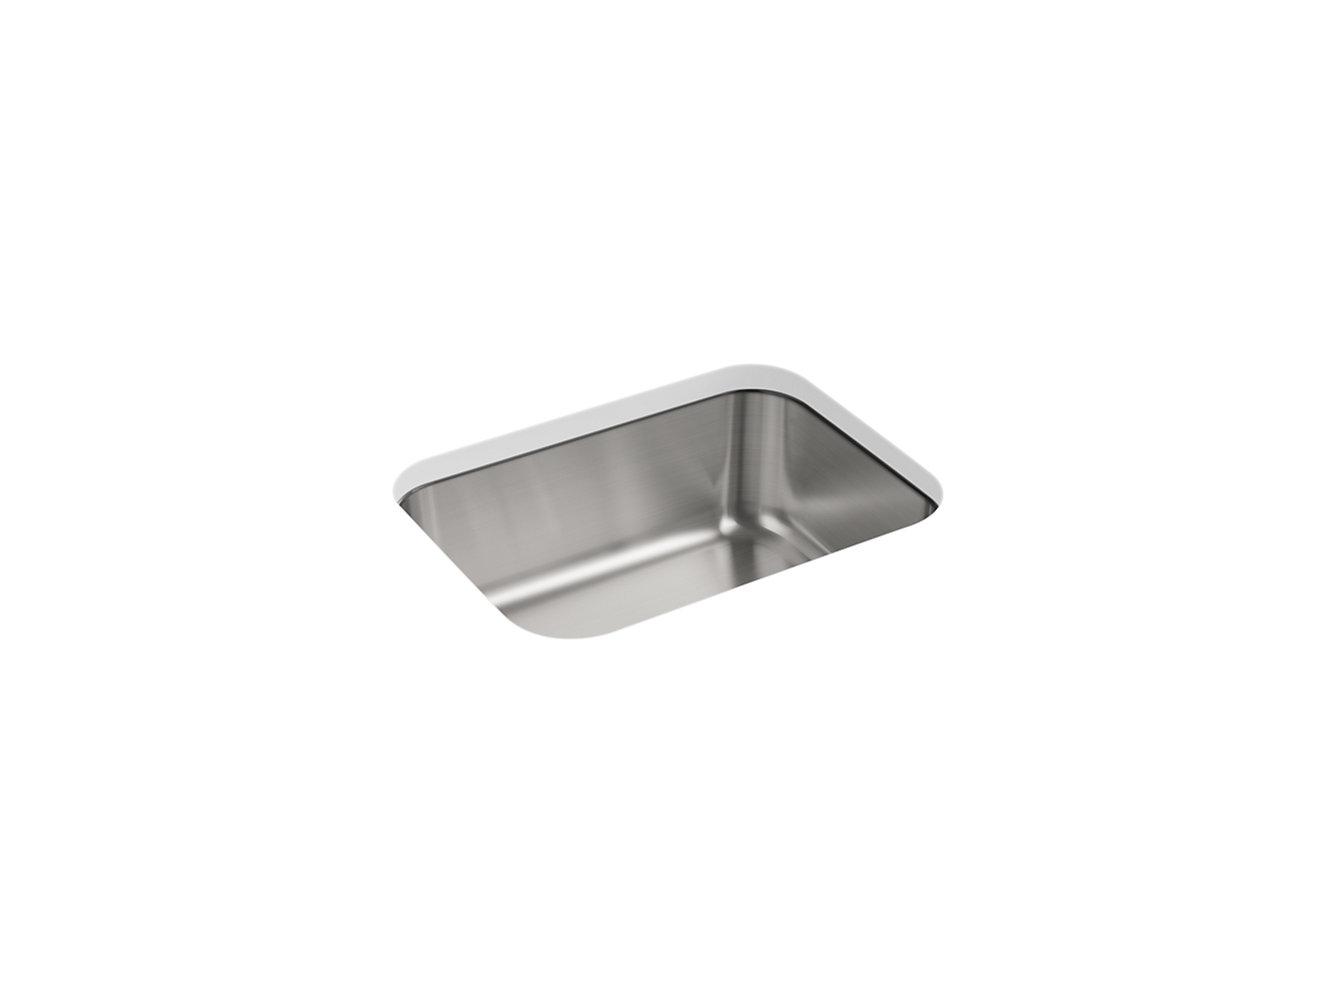 Mcallister Under Mount Single Bowl Kitchen Sink 23 3 8 X 17 11 16 11447 Na Sterling